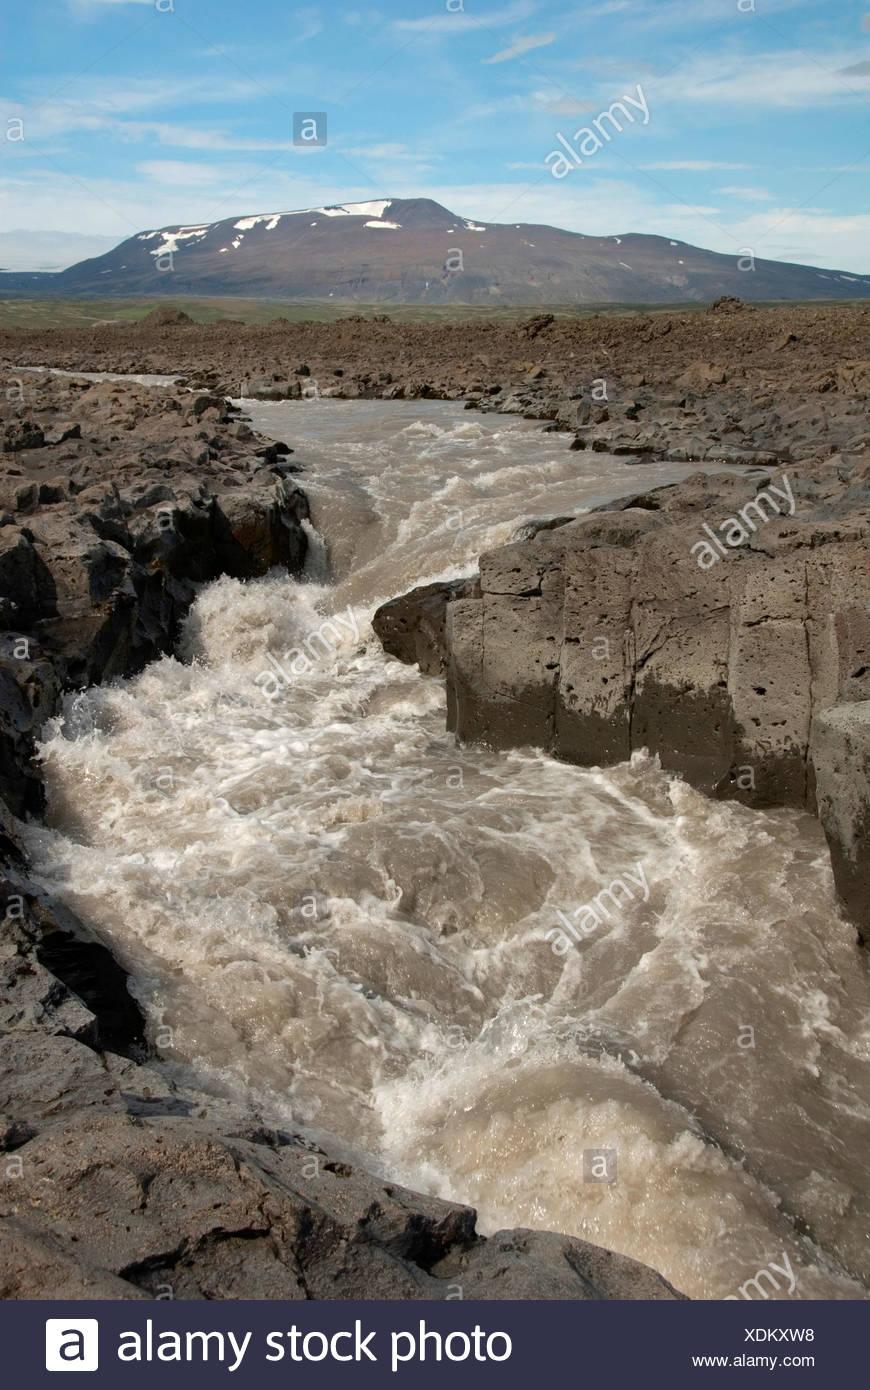 Geita river az Kaldadalsvegur 550, Iceland, Kaldidalur - Stock Image